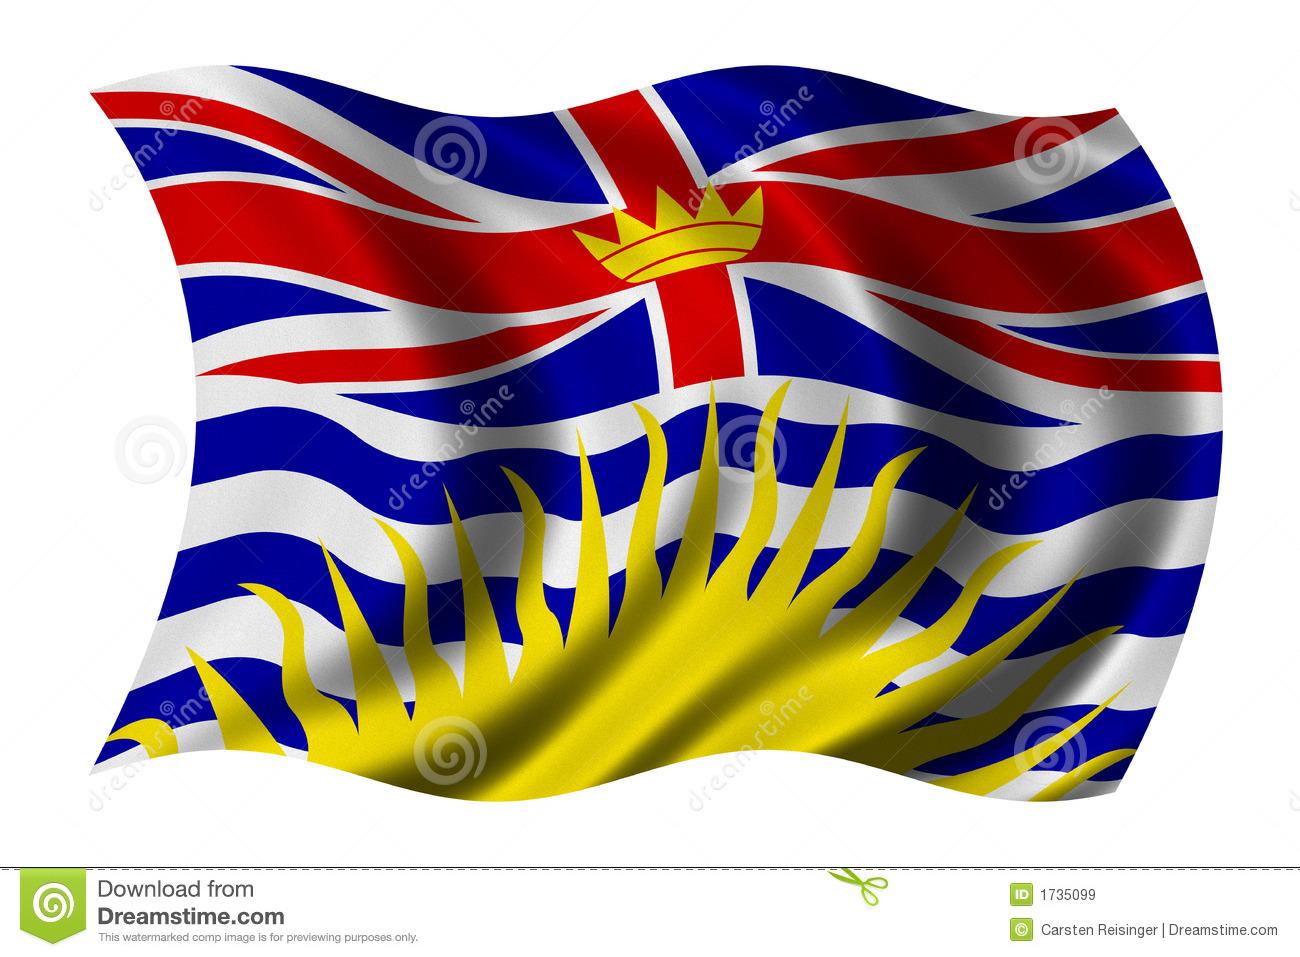 British Columbia clipart #14, Download drawings